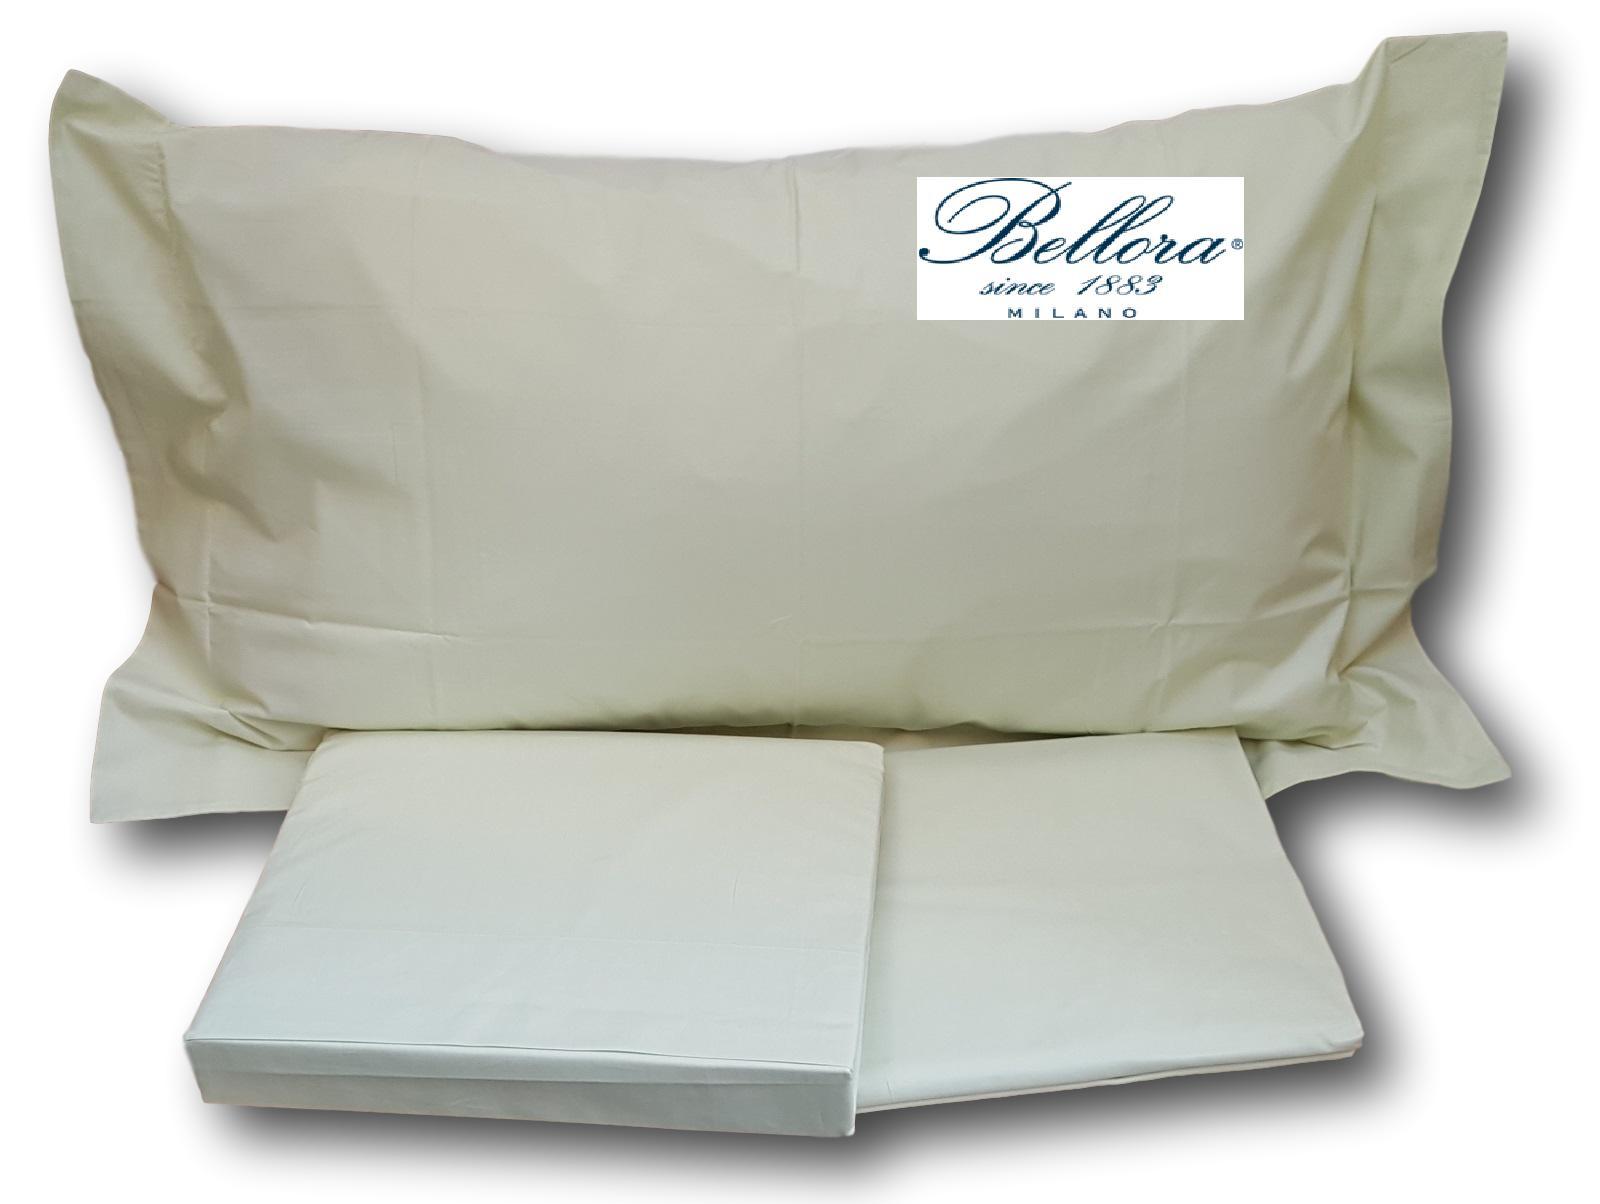 BELLORA. Completo letto, Lenzuola MILAN in Cotone 100%. Matrimoniale, 2 piazze.